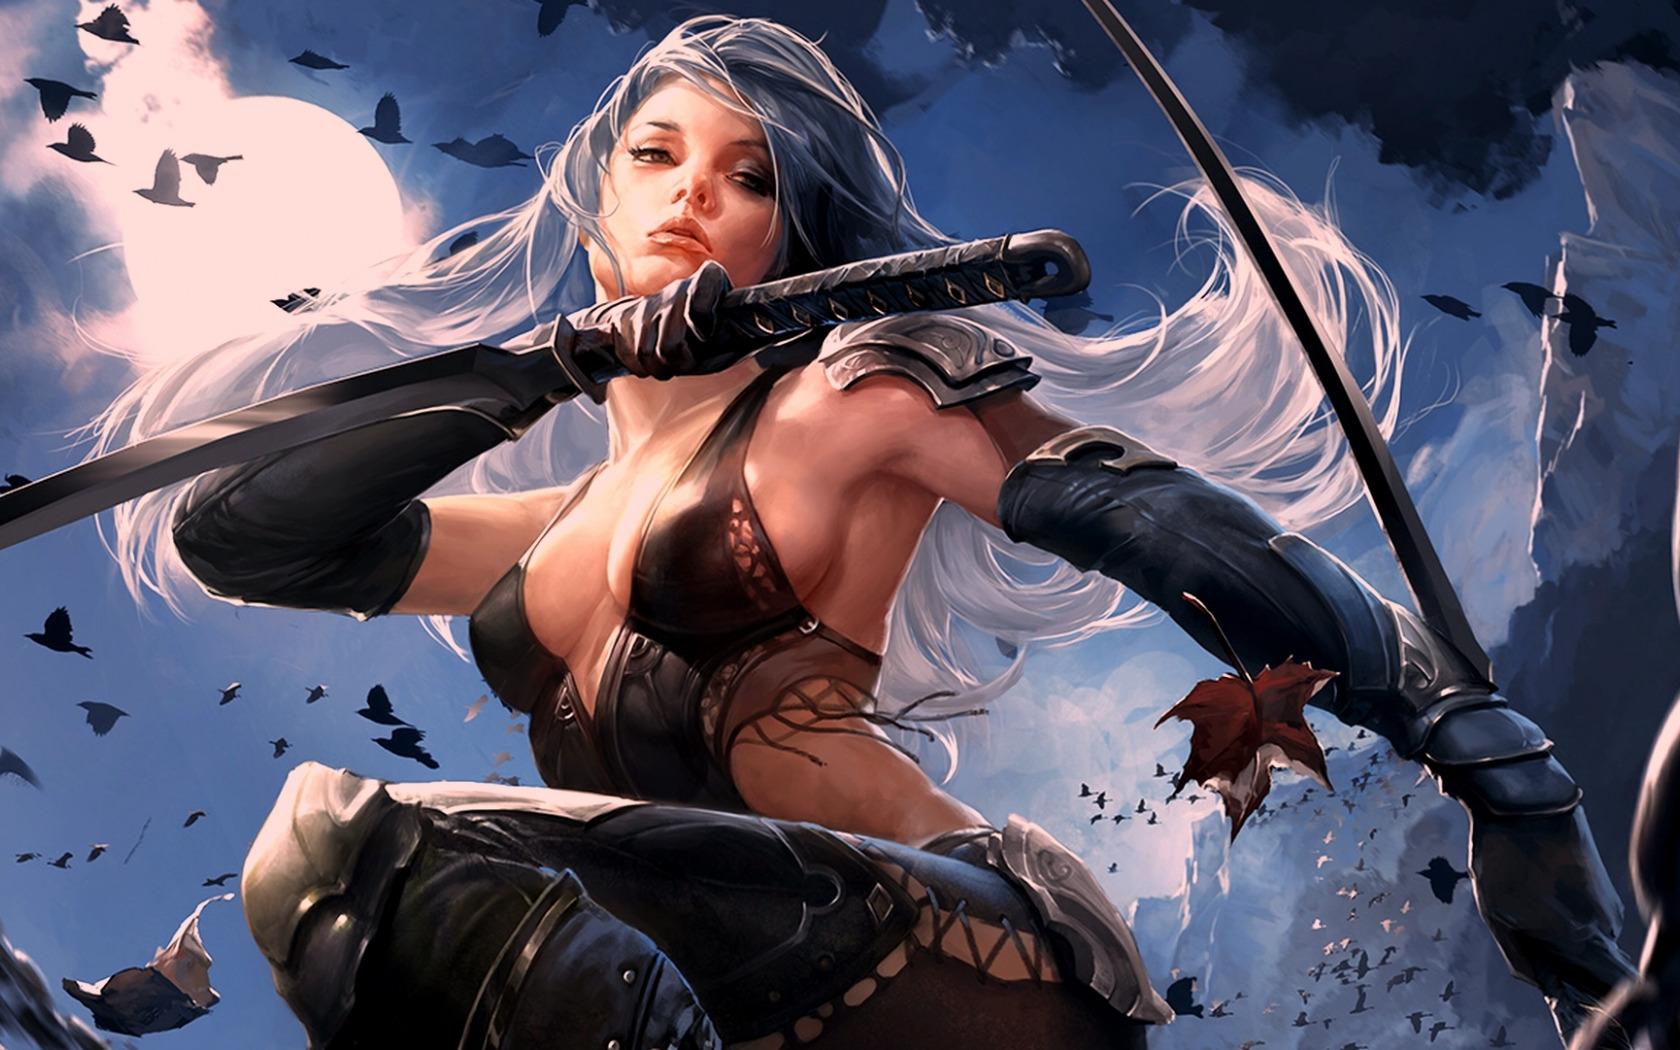 Warrior girls erotic scene